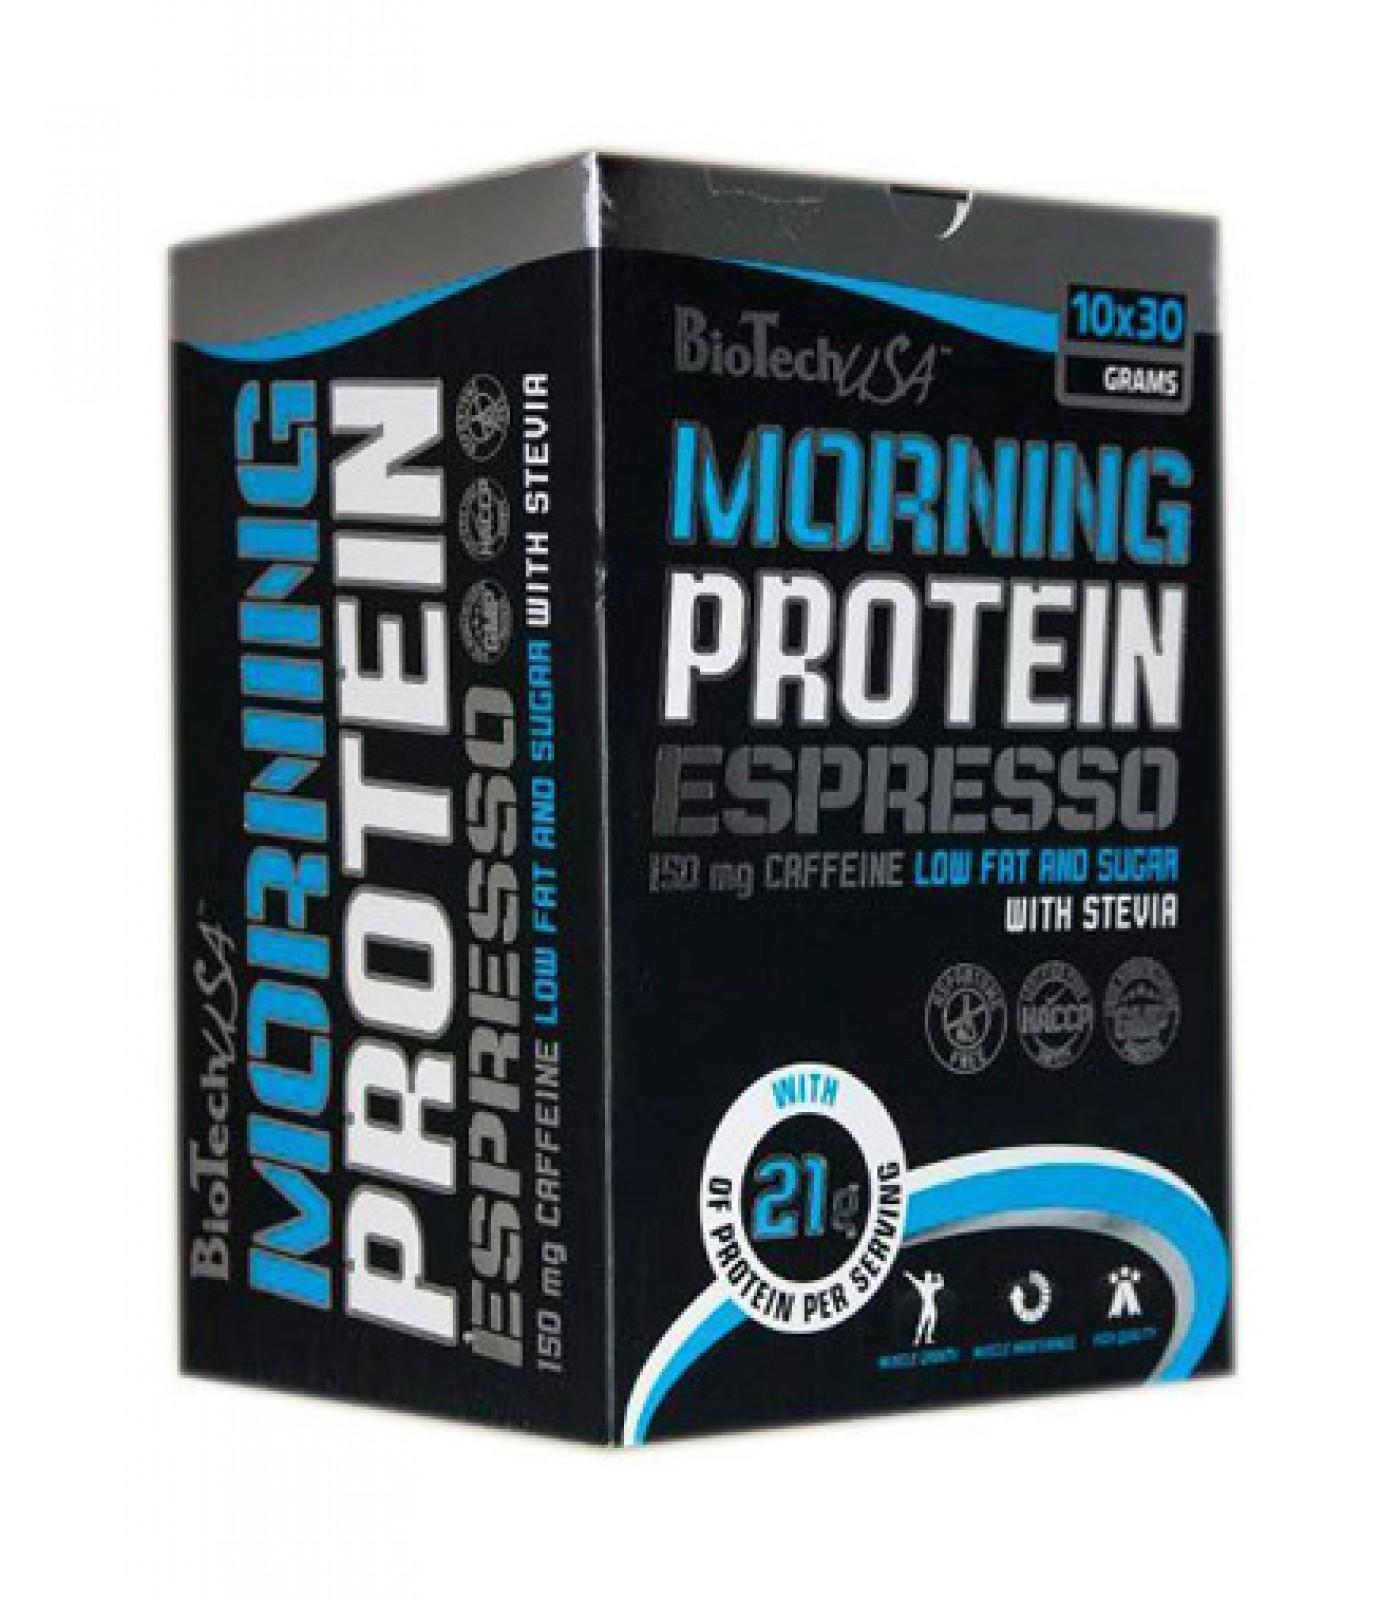 BioTech - Morning Protein / 10x30g.